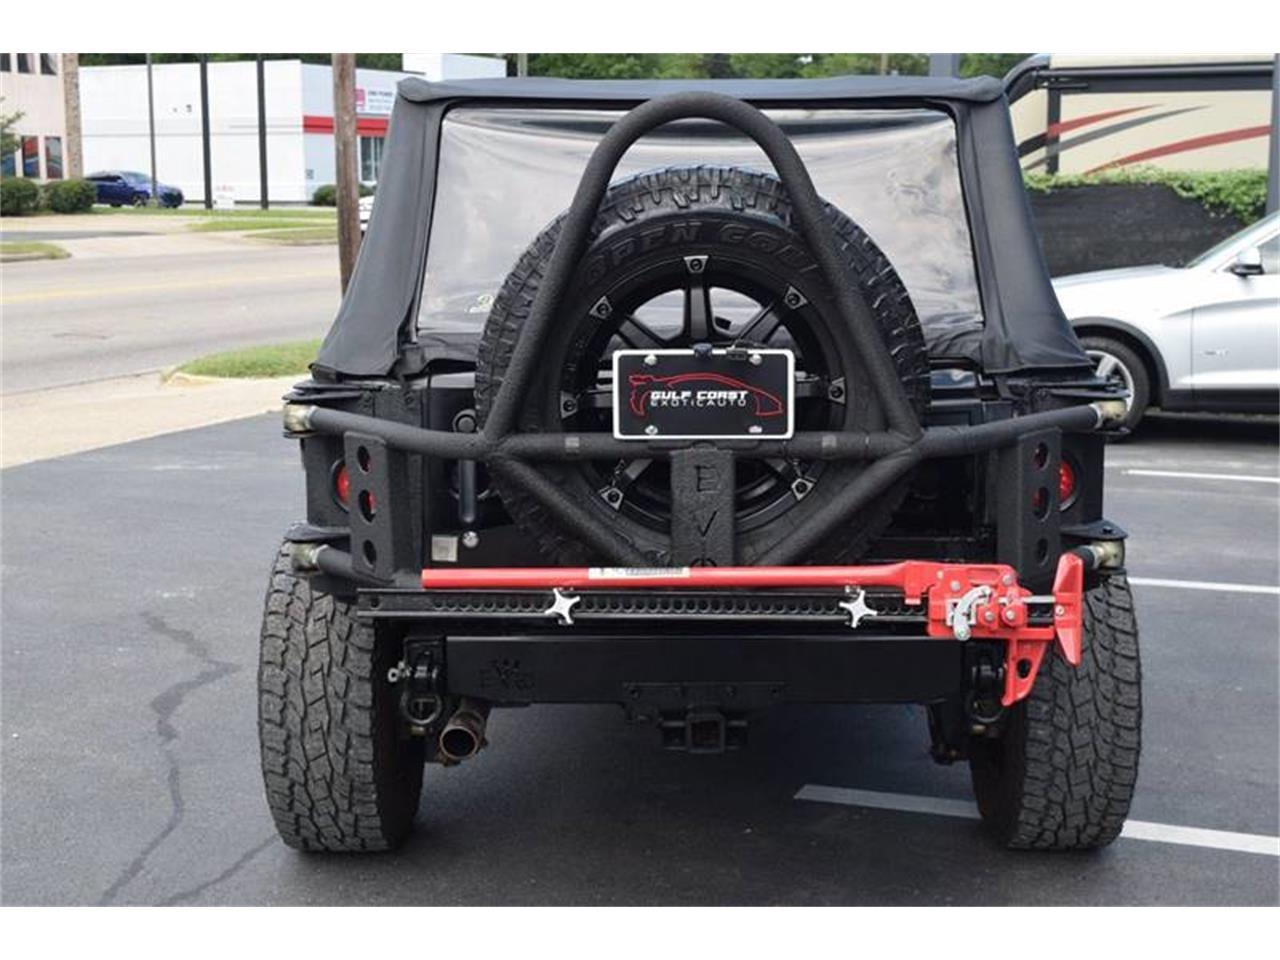 2011 Jeep Wrangler (CC-1244480) for sale in Biloxi, Mississippi